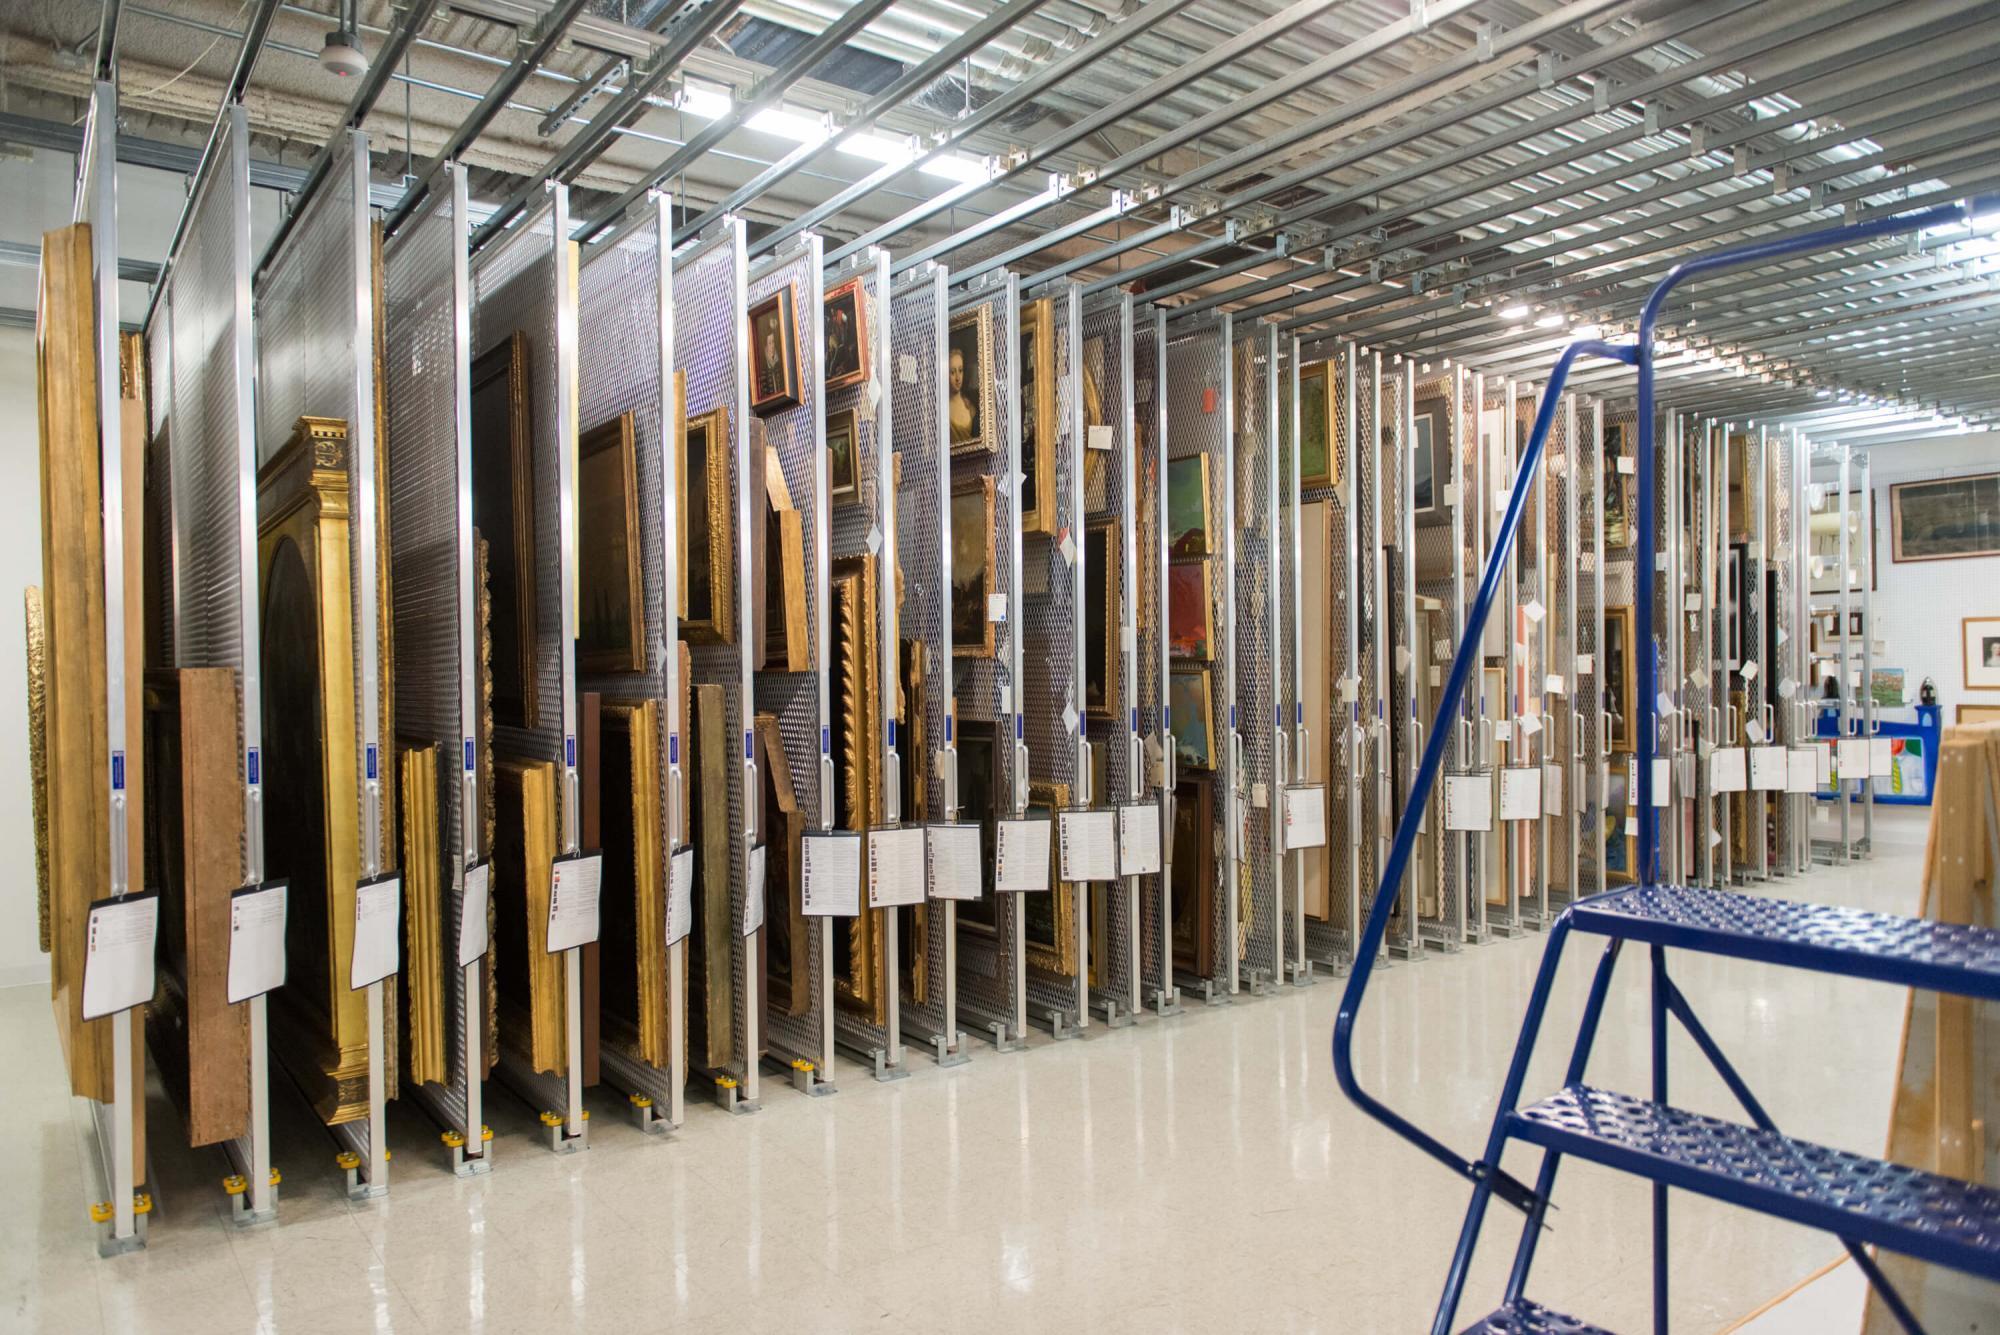 art storage room